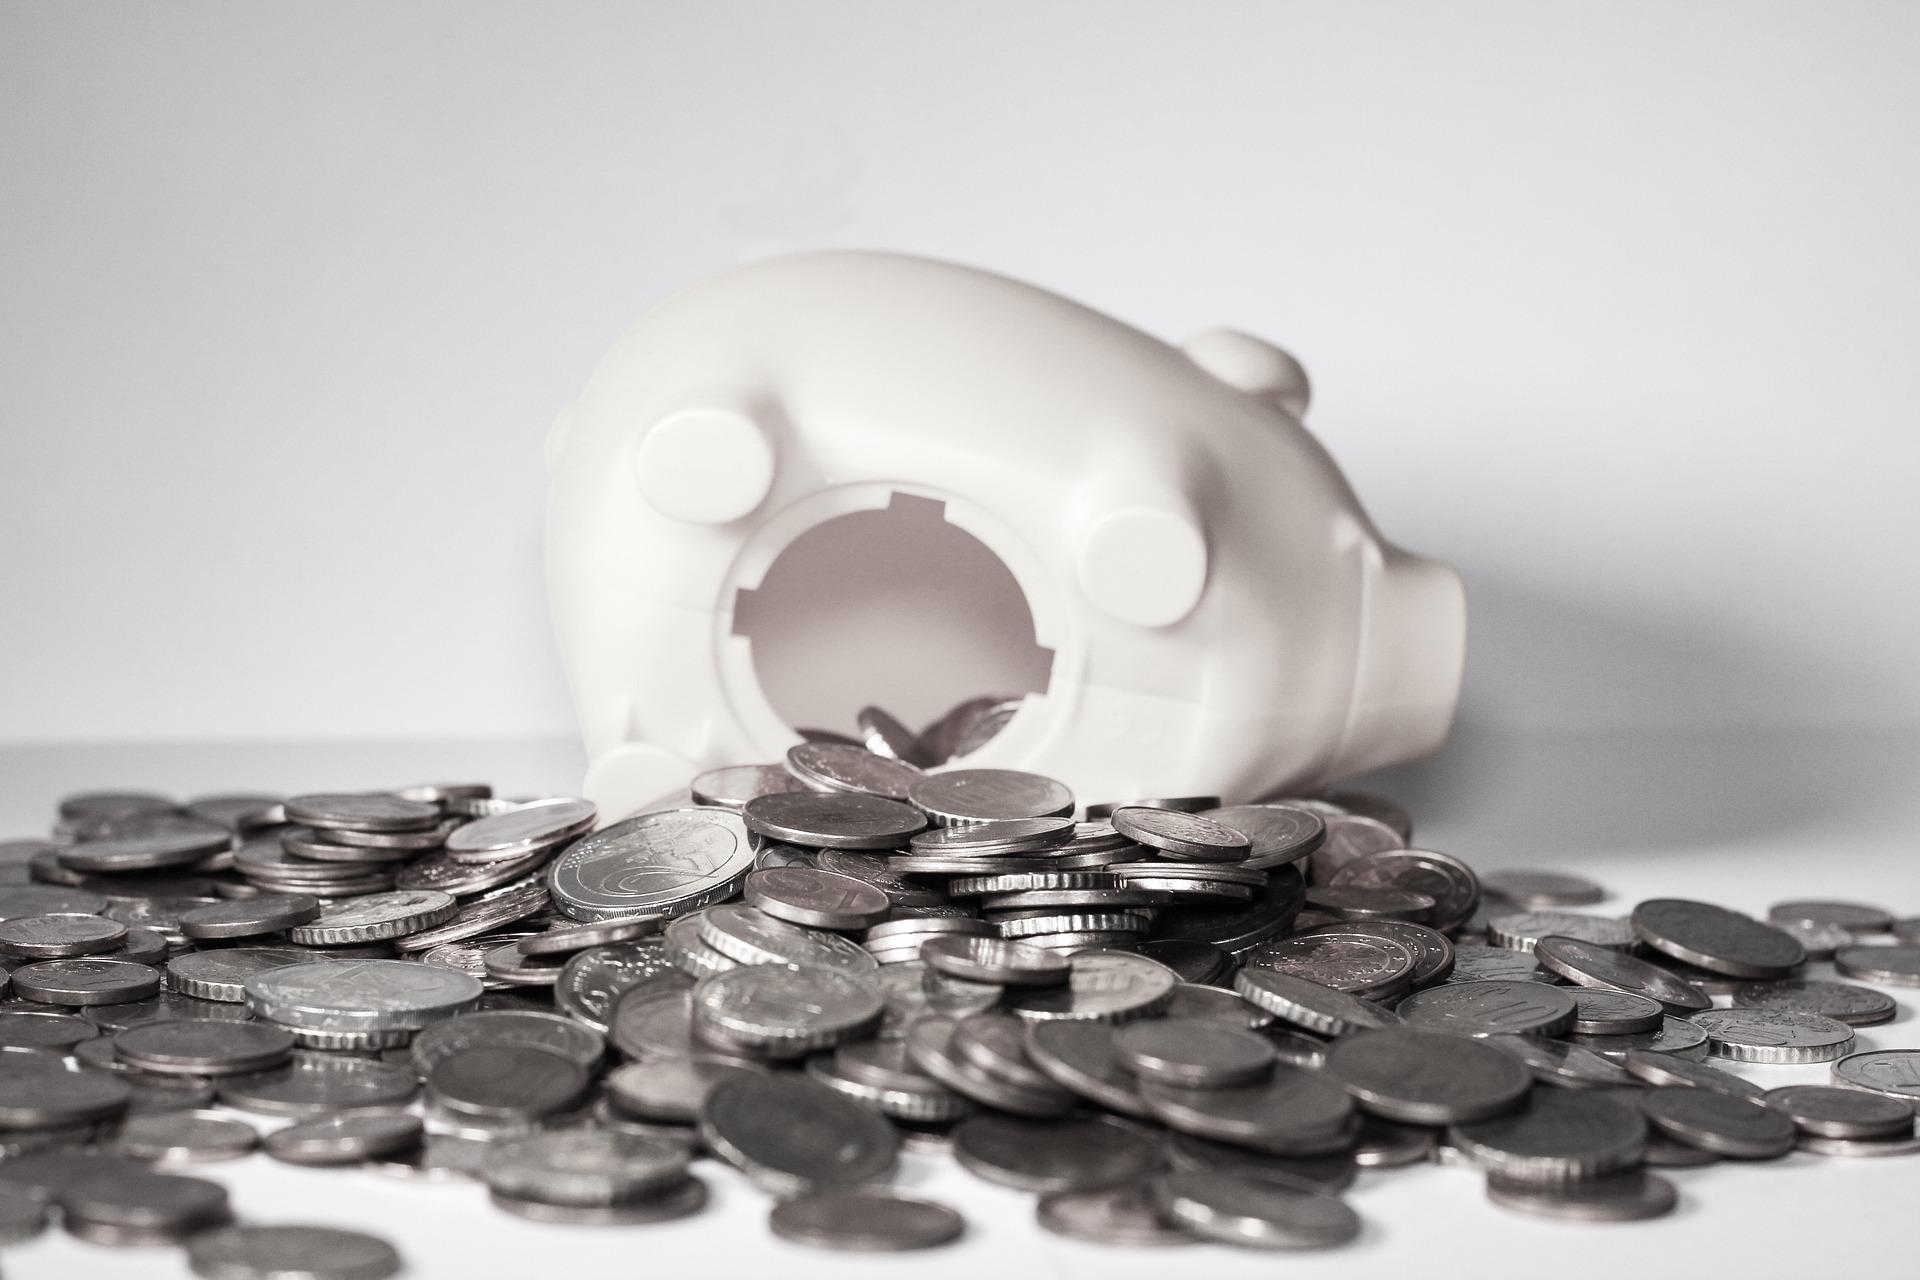 piggy bank knocked over, saving money